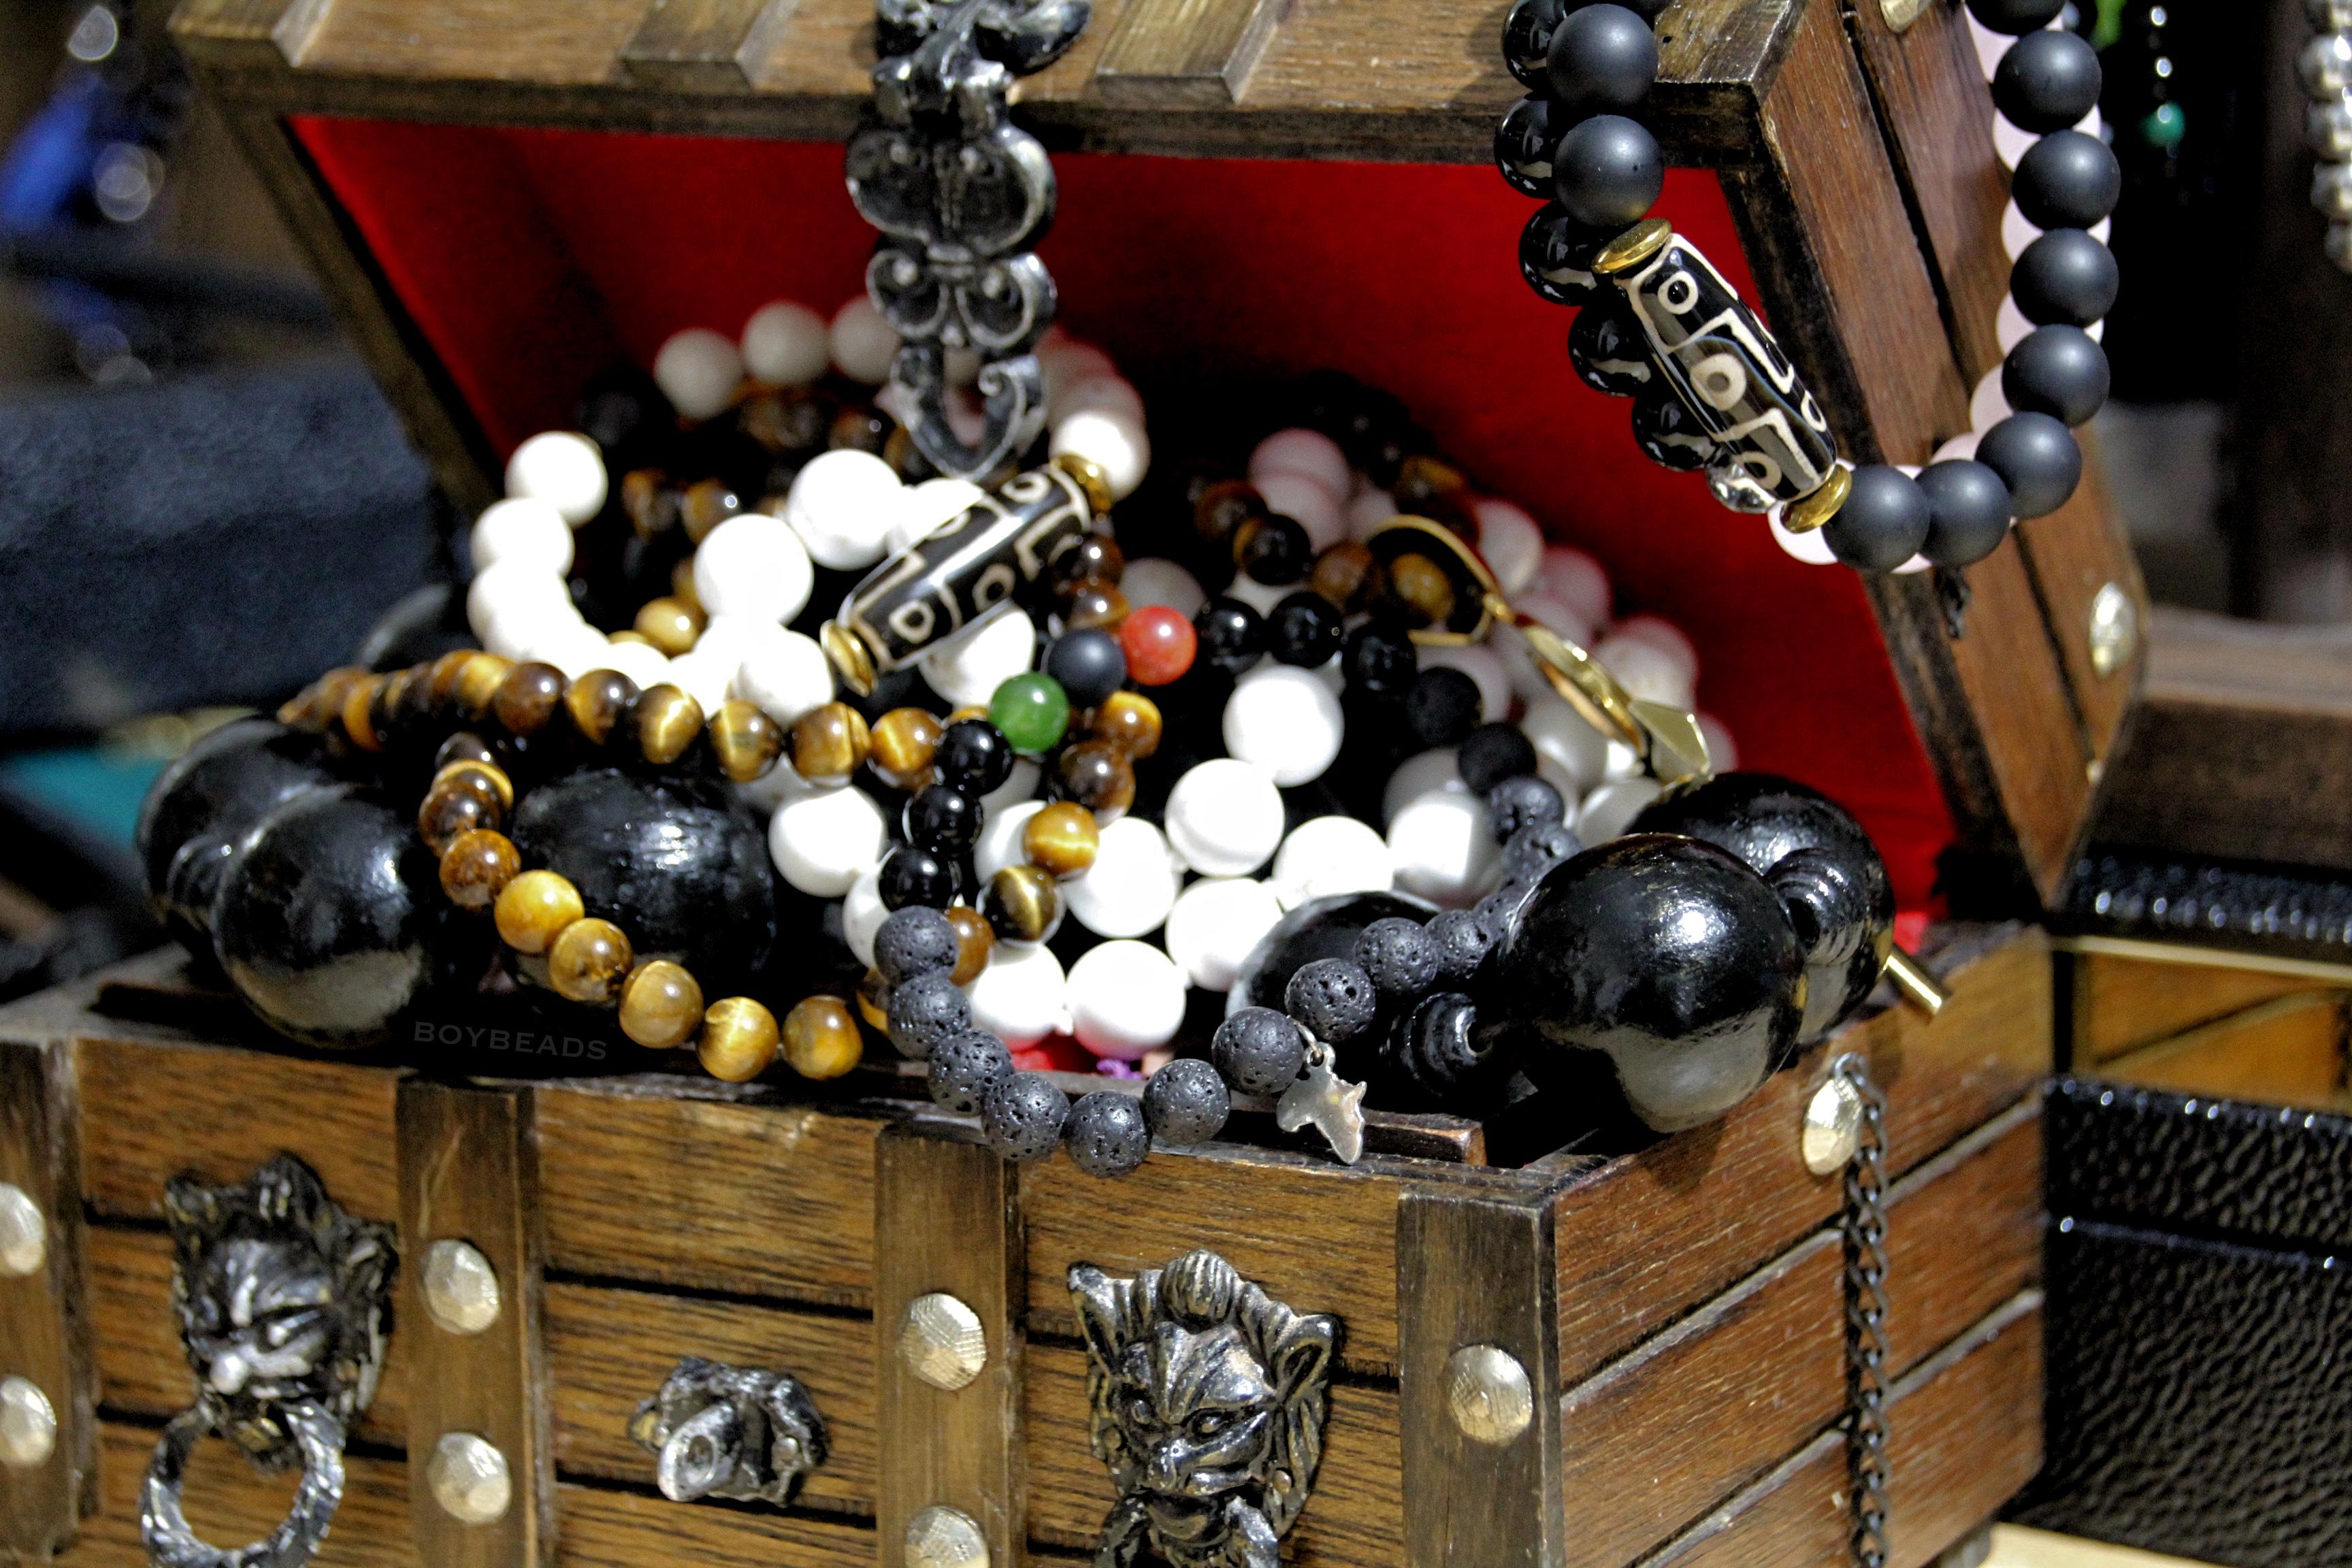 boybeads-treasure-chest-mens-bead-bracelet-jewelry-box.jpg